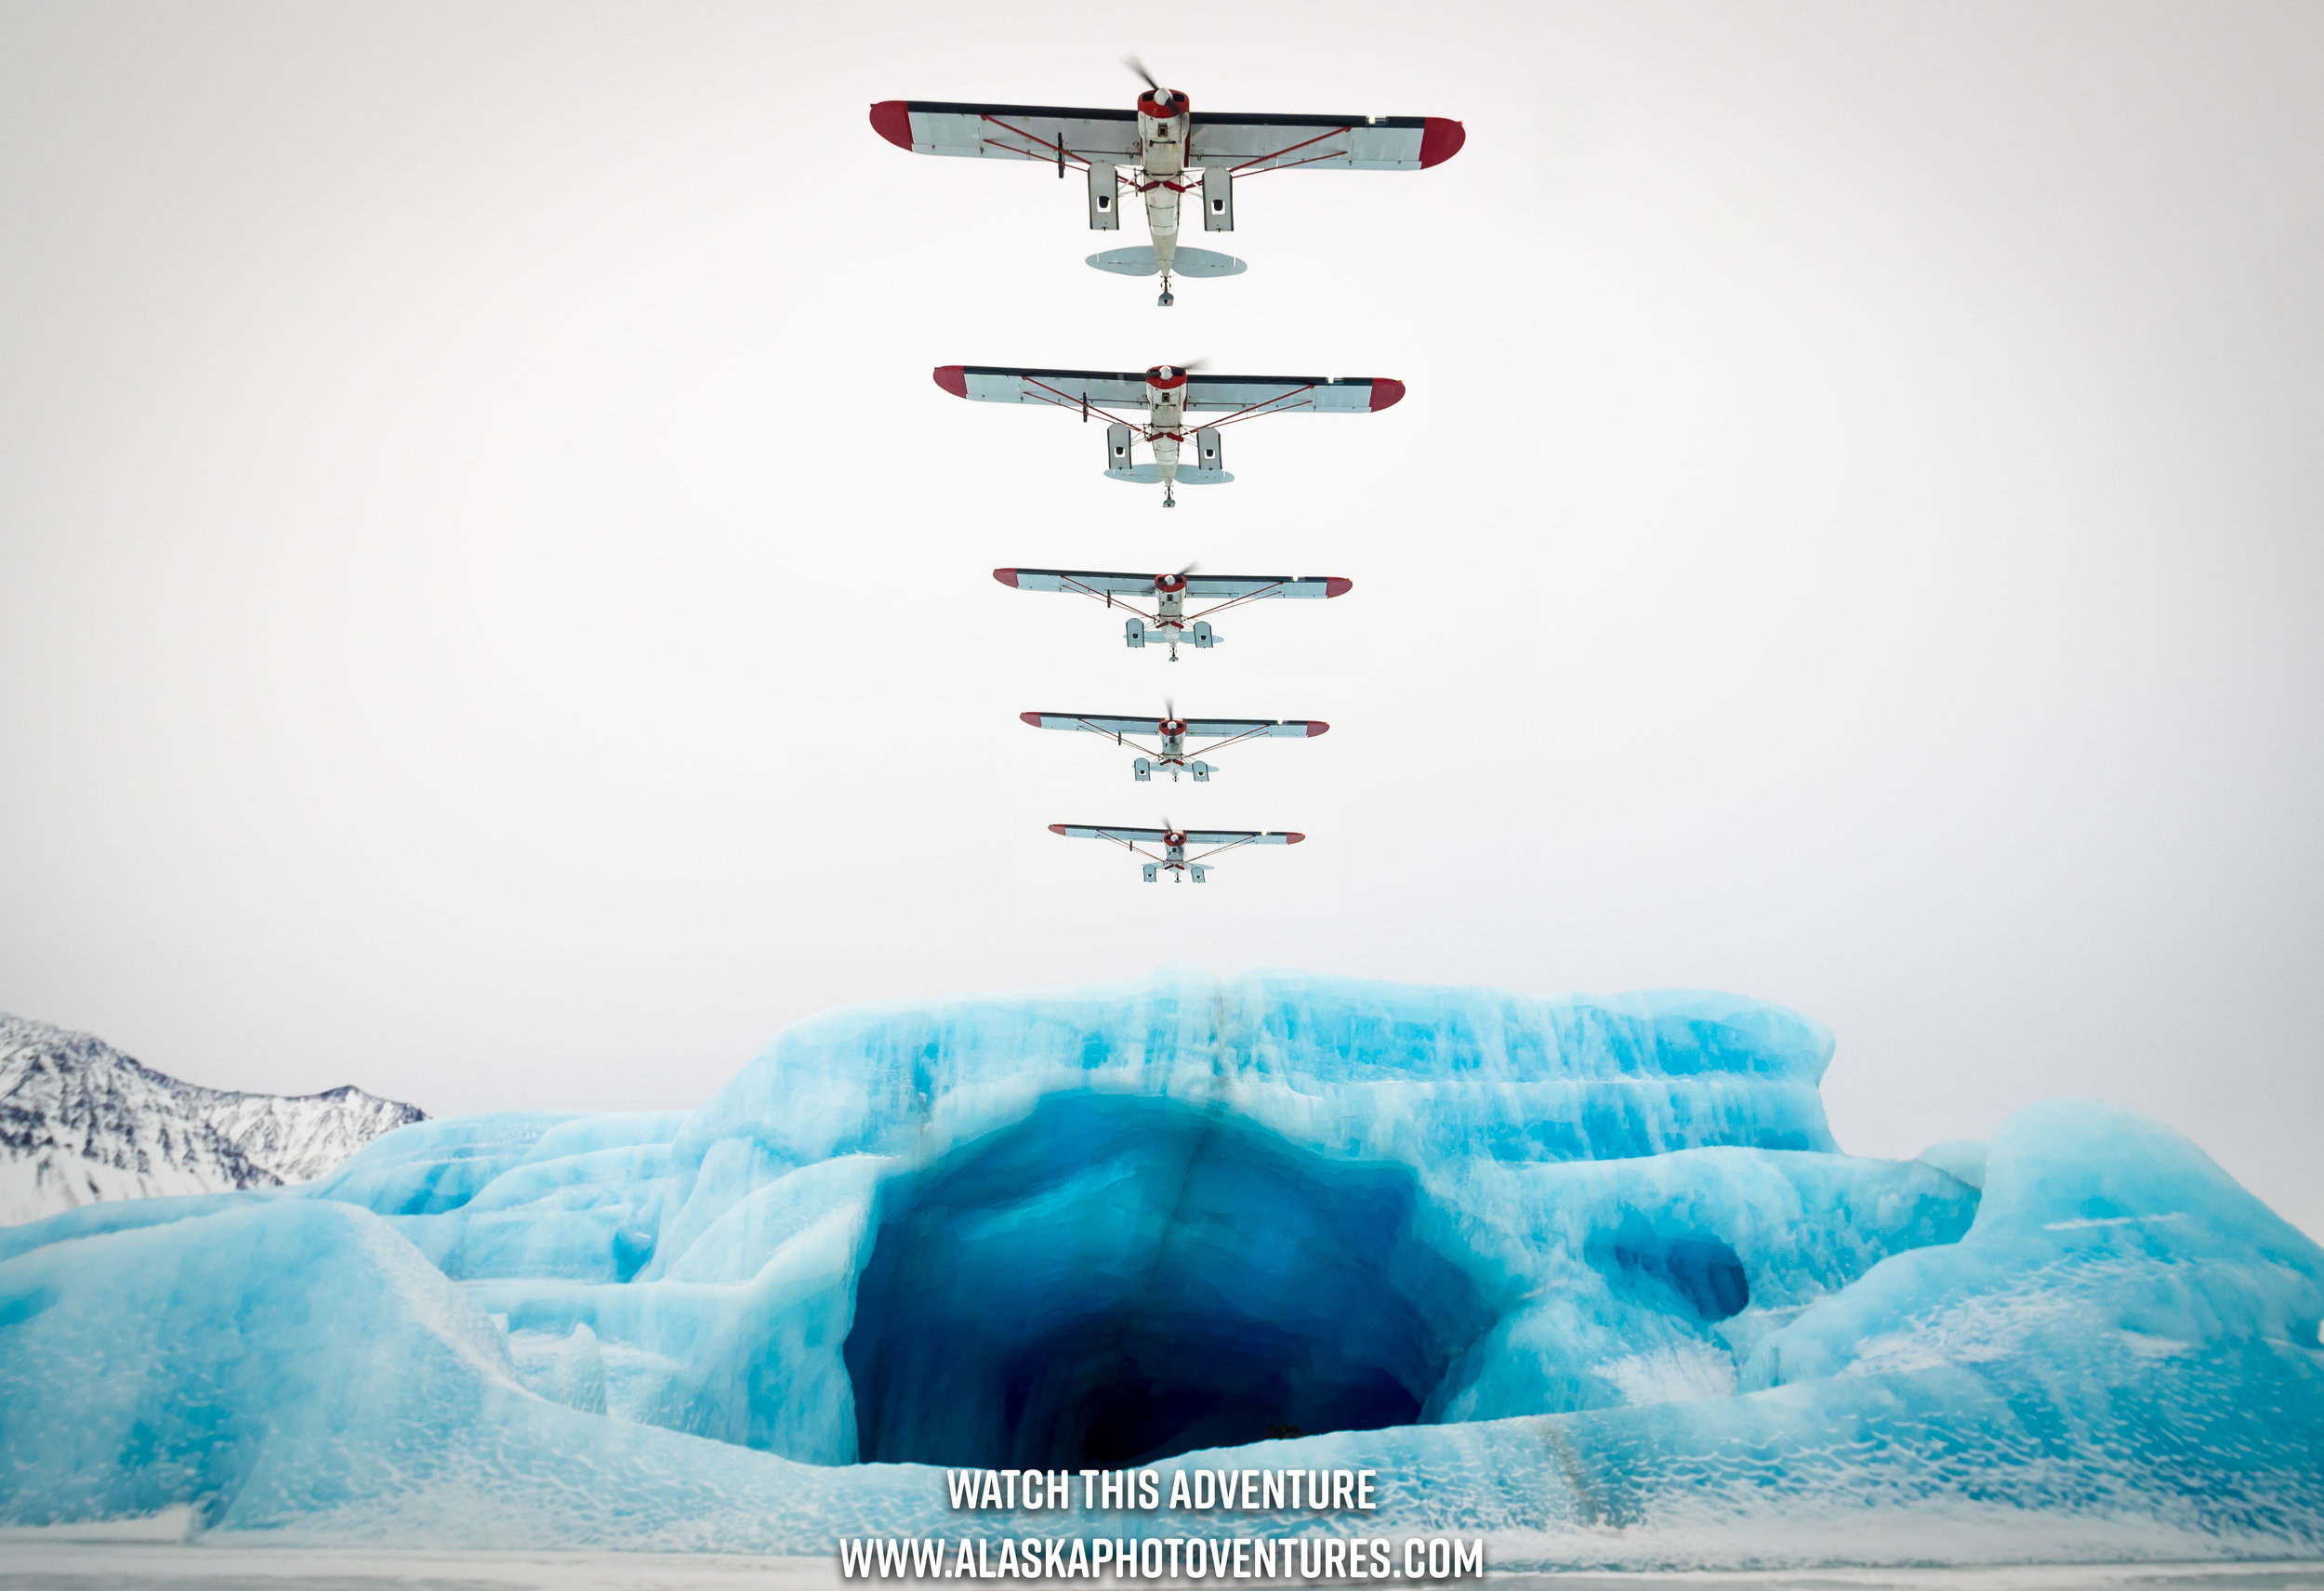 alaska-bush-planes-frozen-lake-colony-glacier-adventure-photography3.jpg